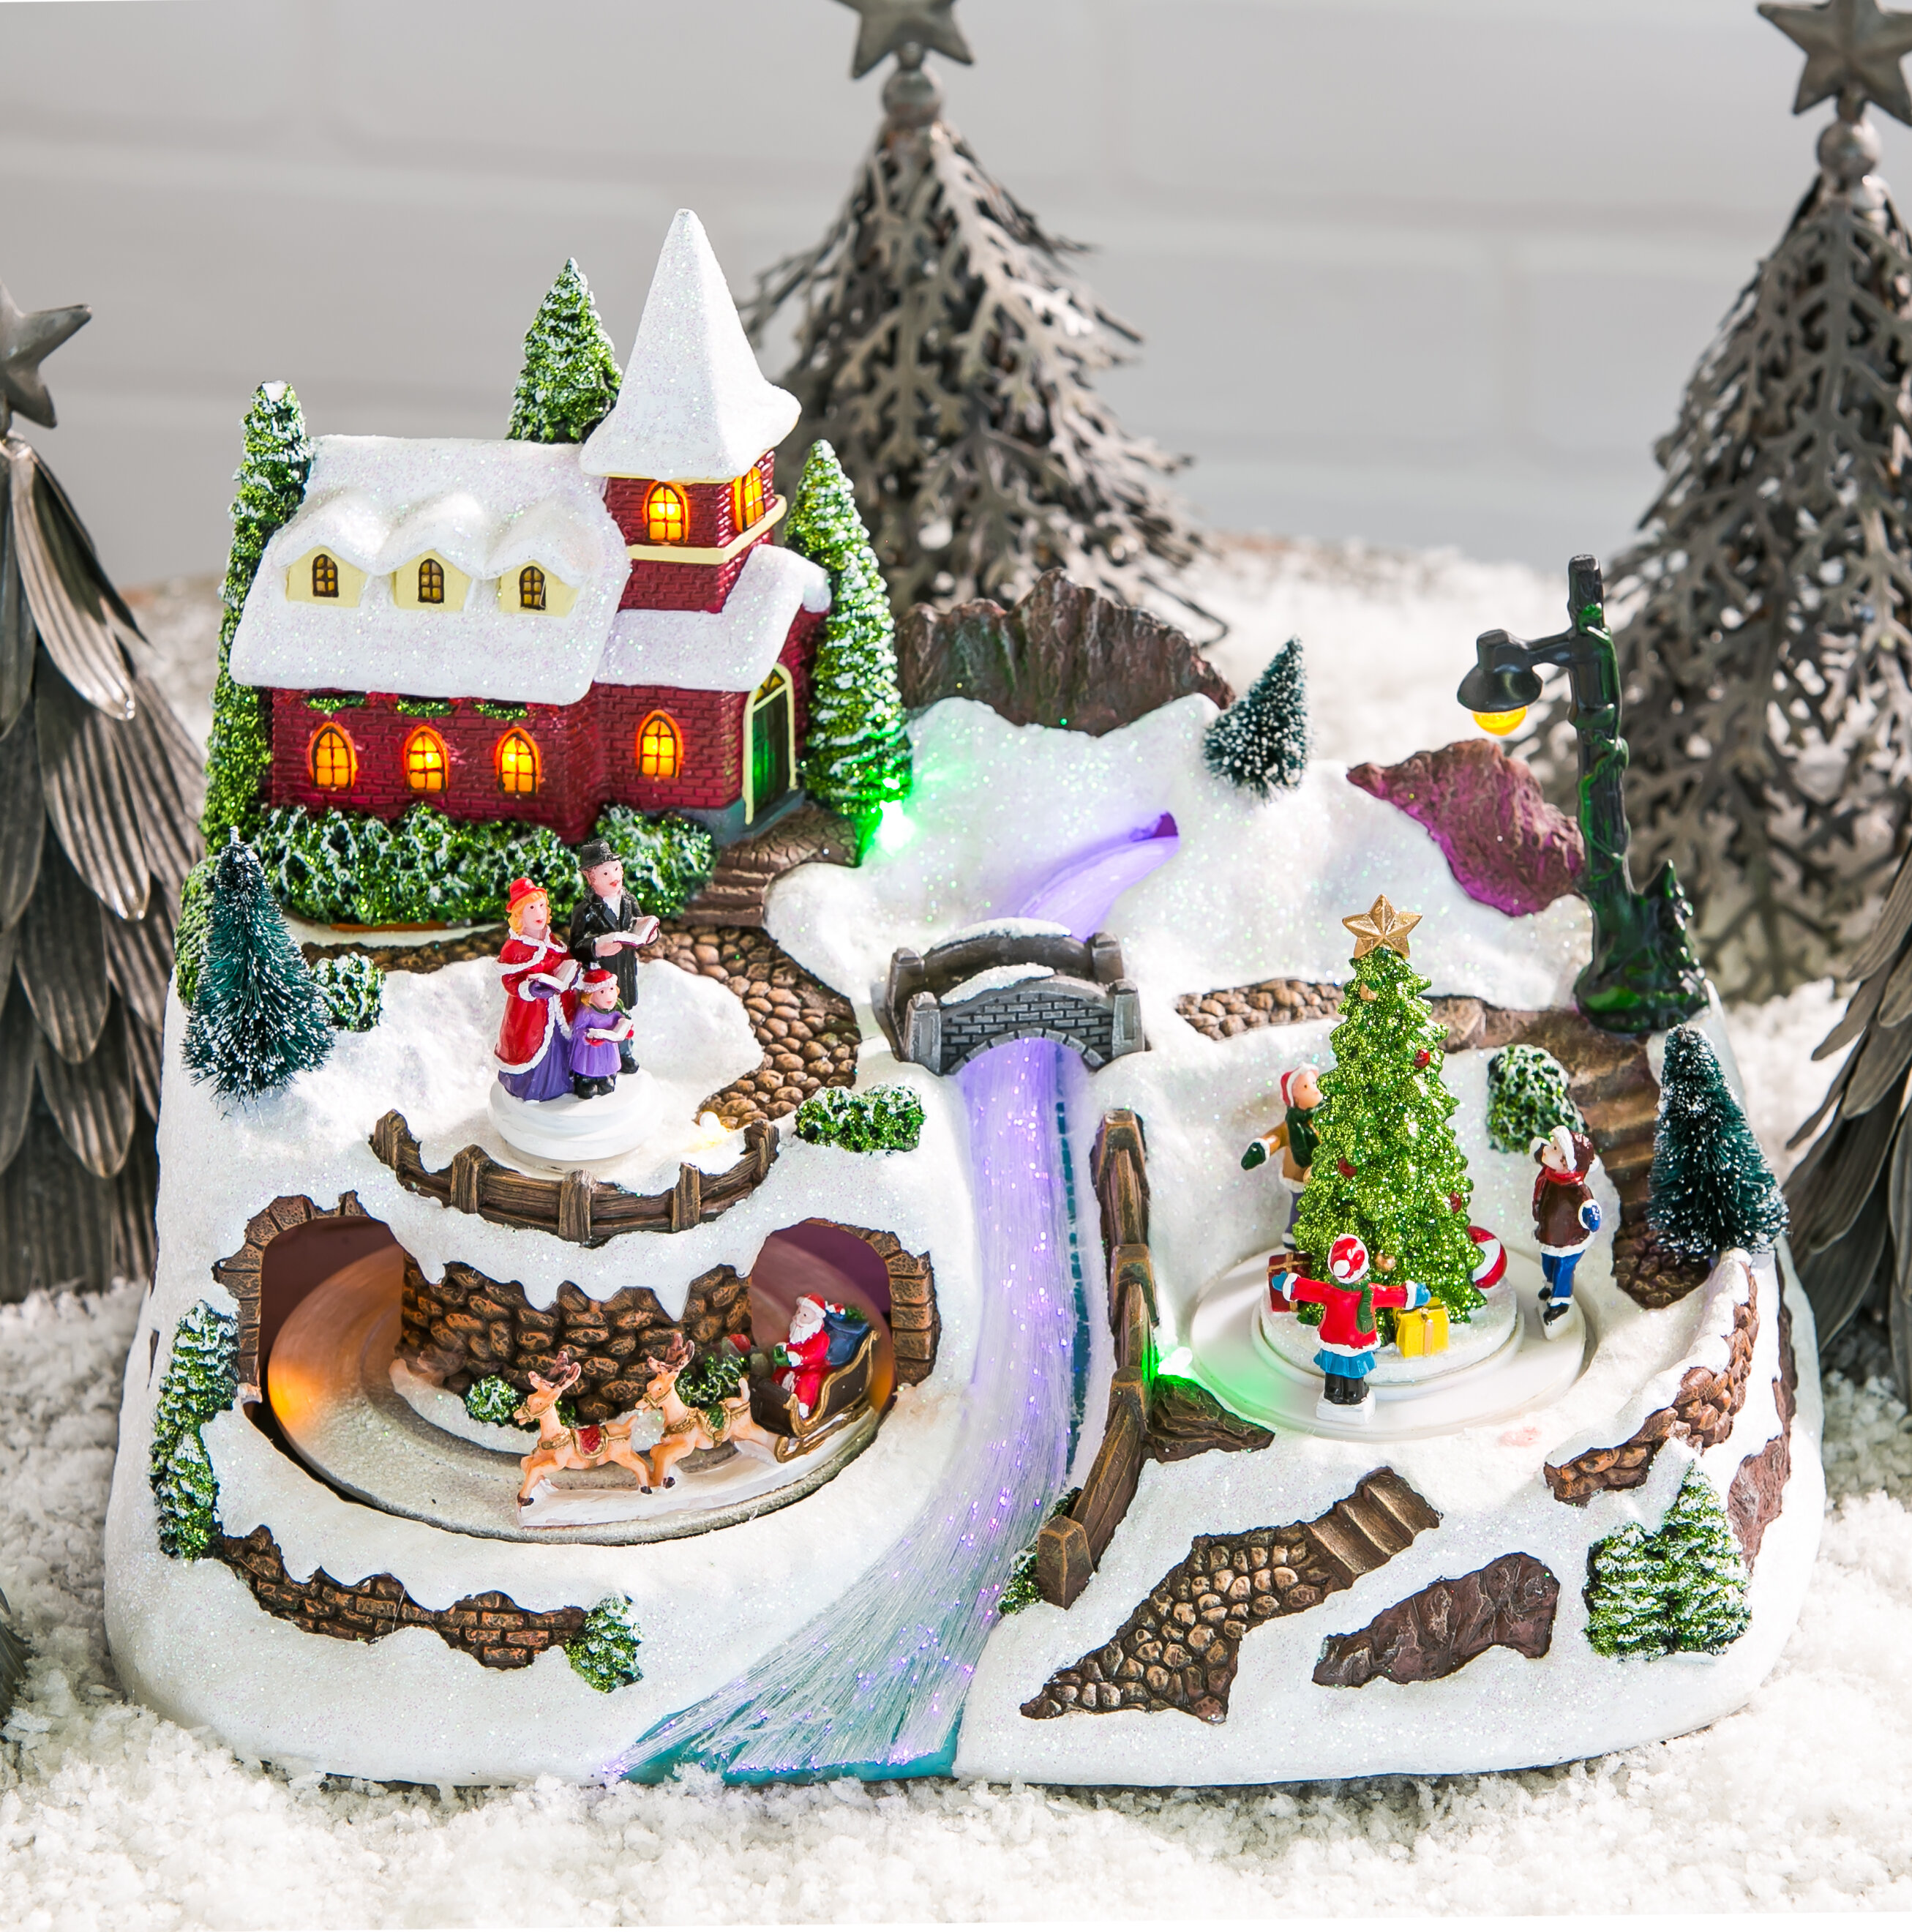 Christmas Village.Christmas Village With River Led Scene